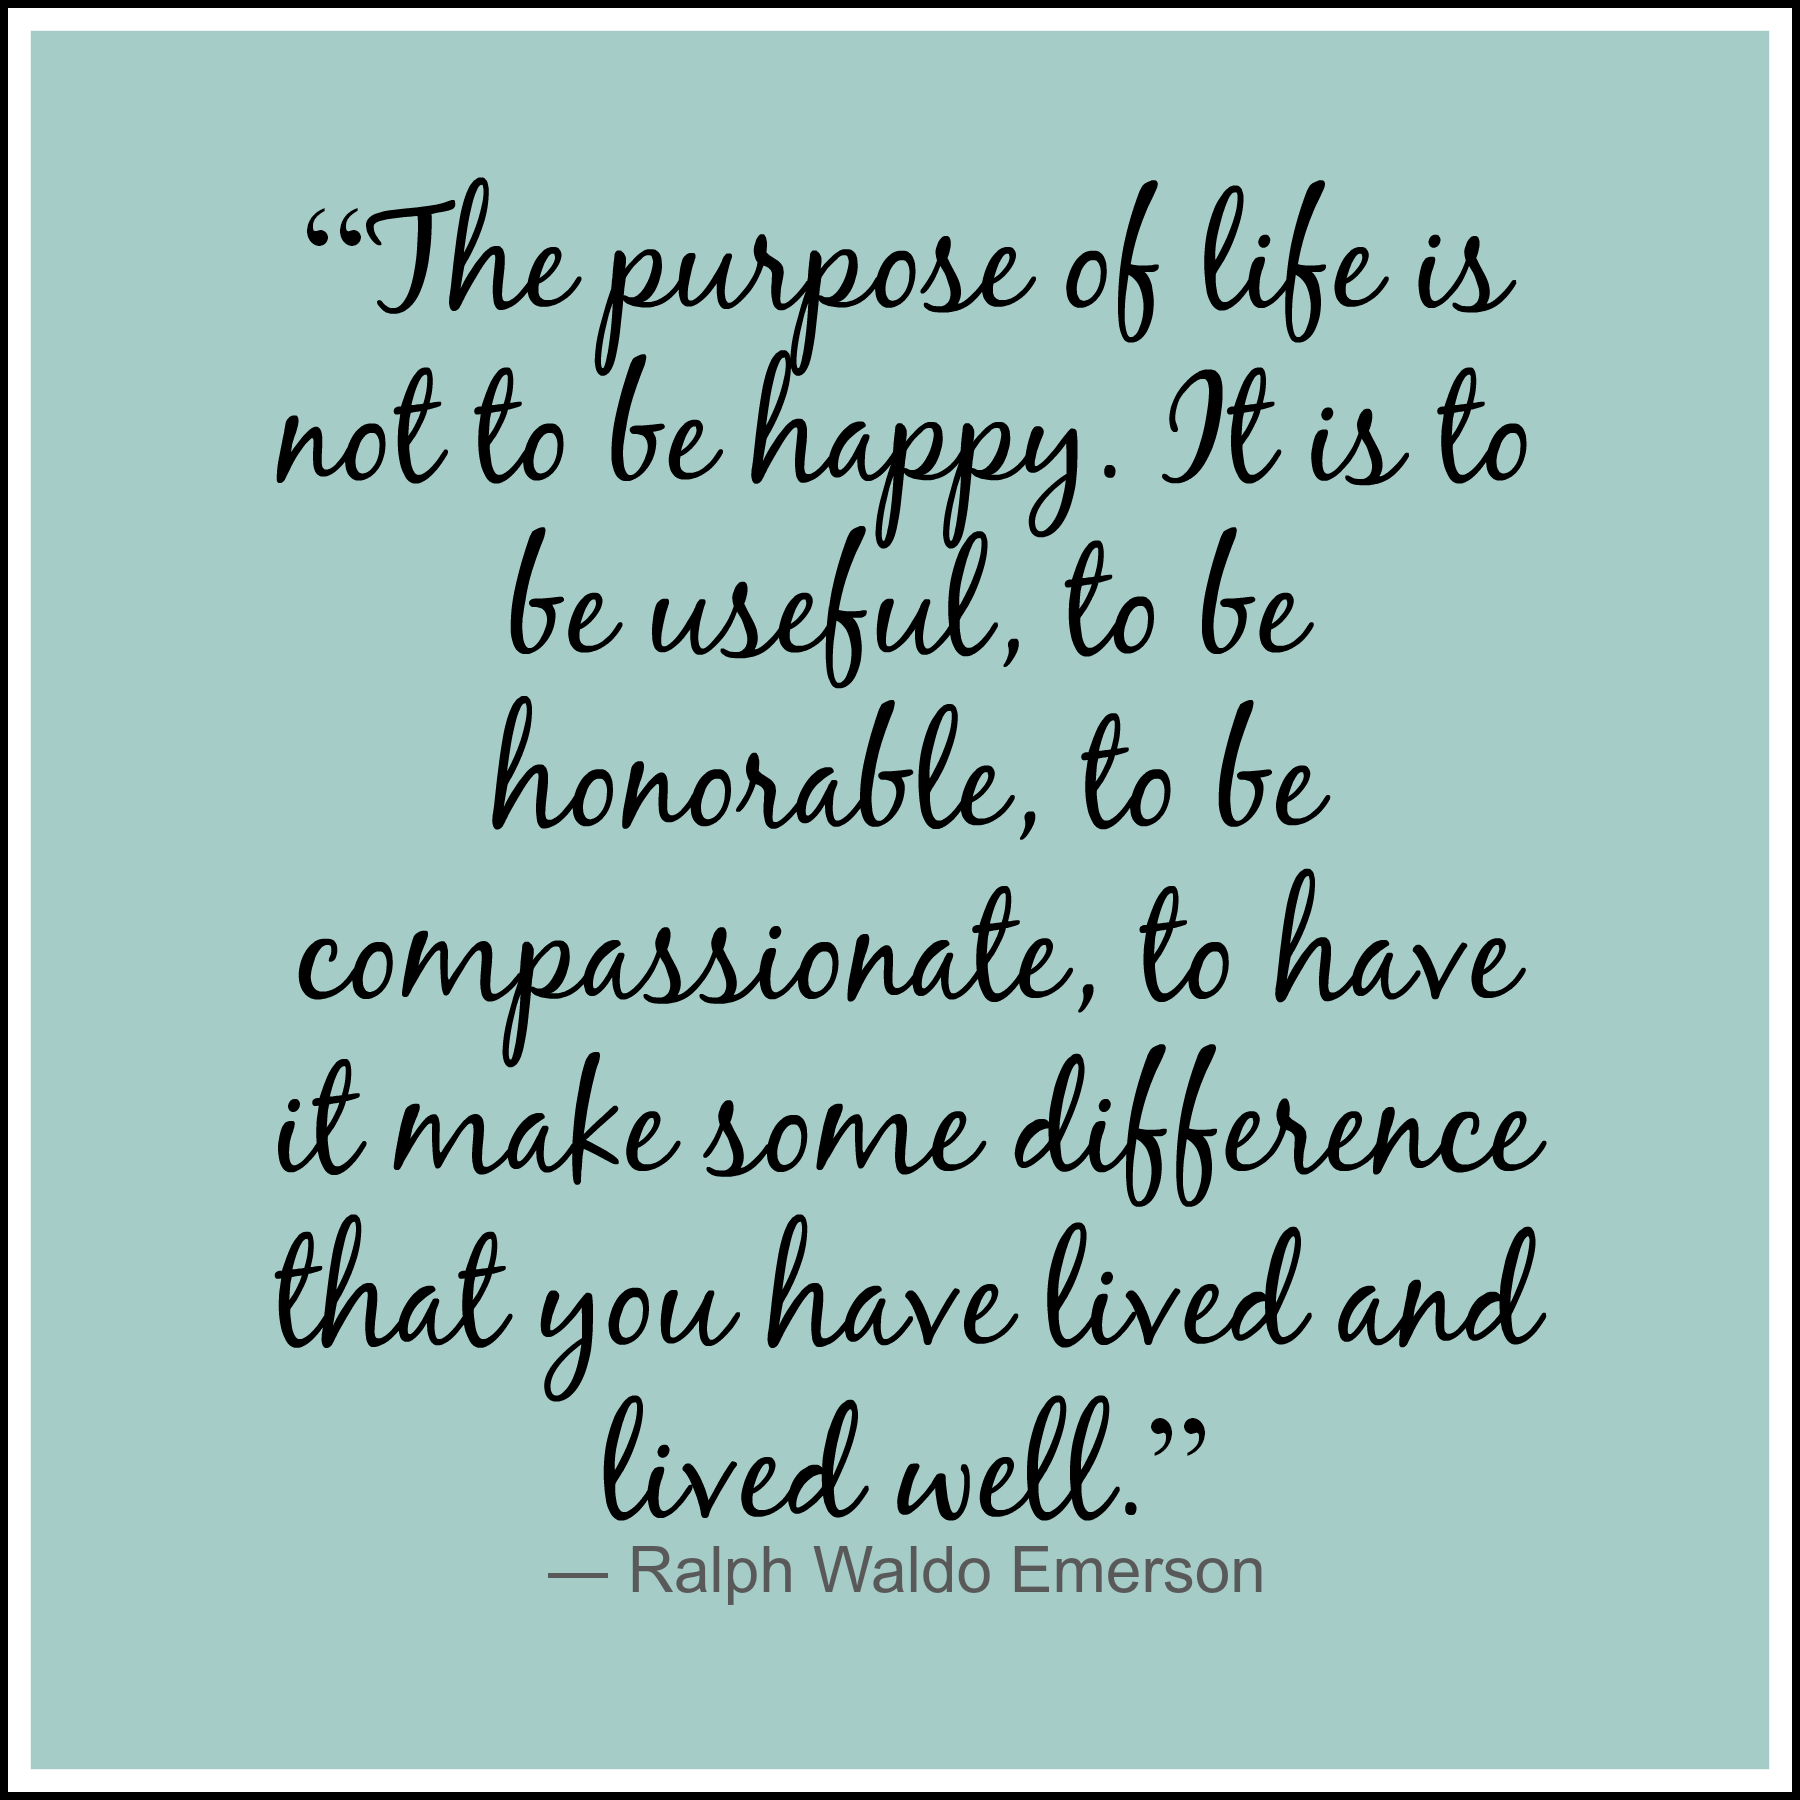 Ralph Waldo Emerson Happiness Pinterest thumbnail